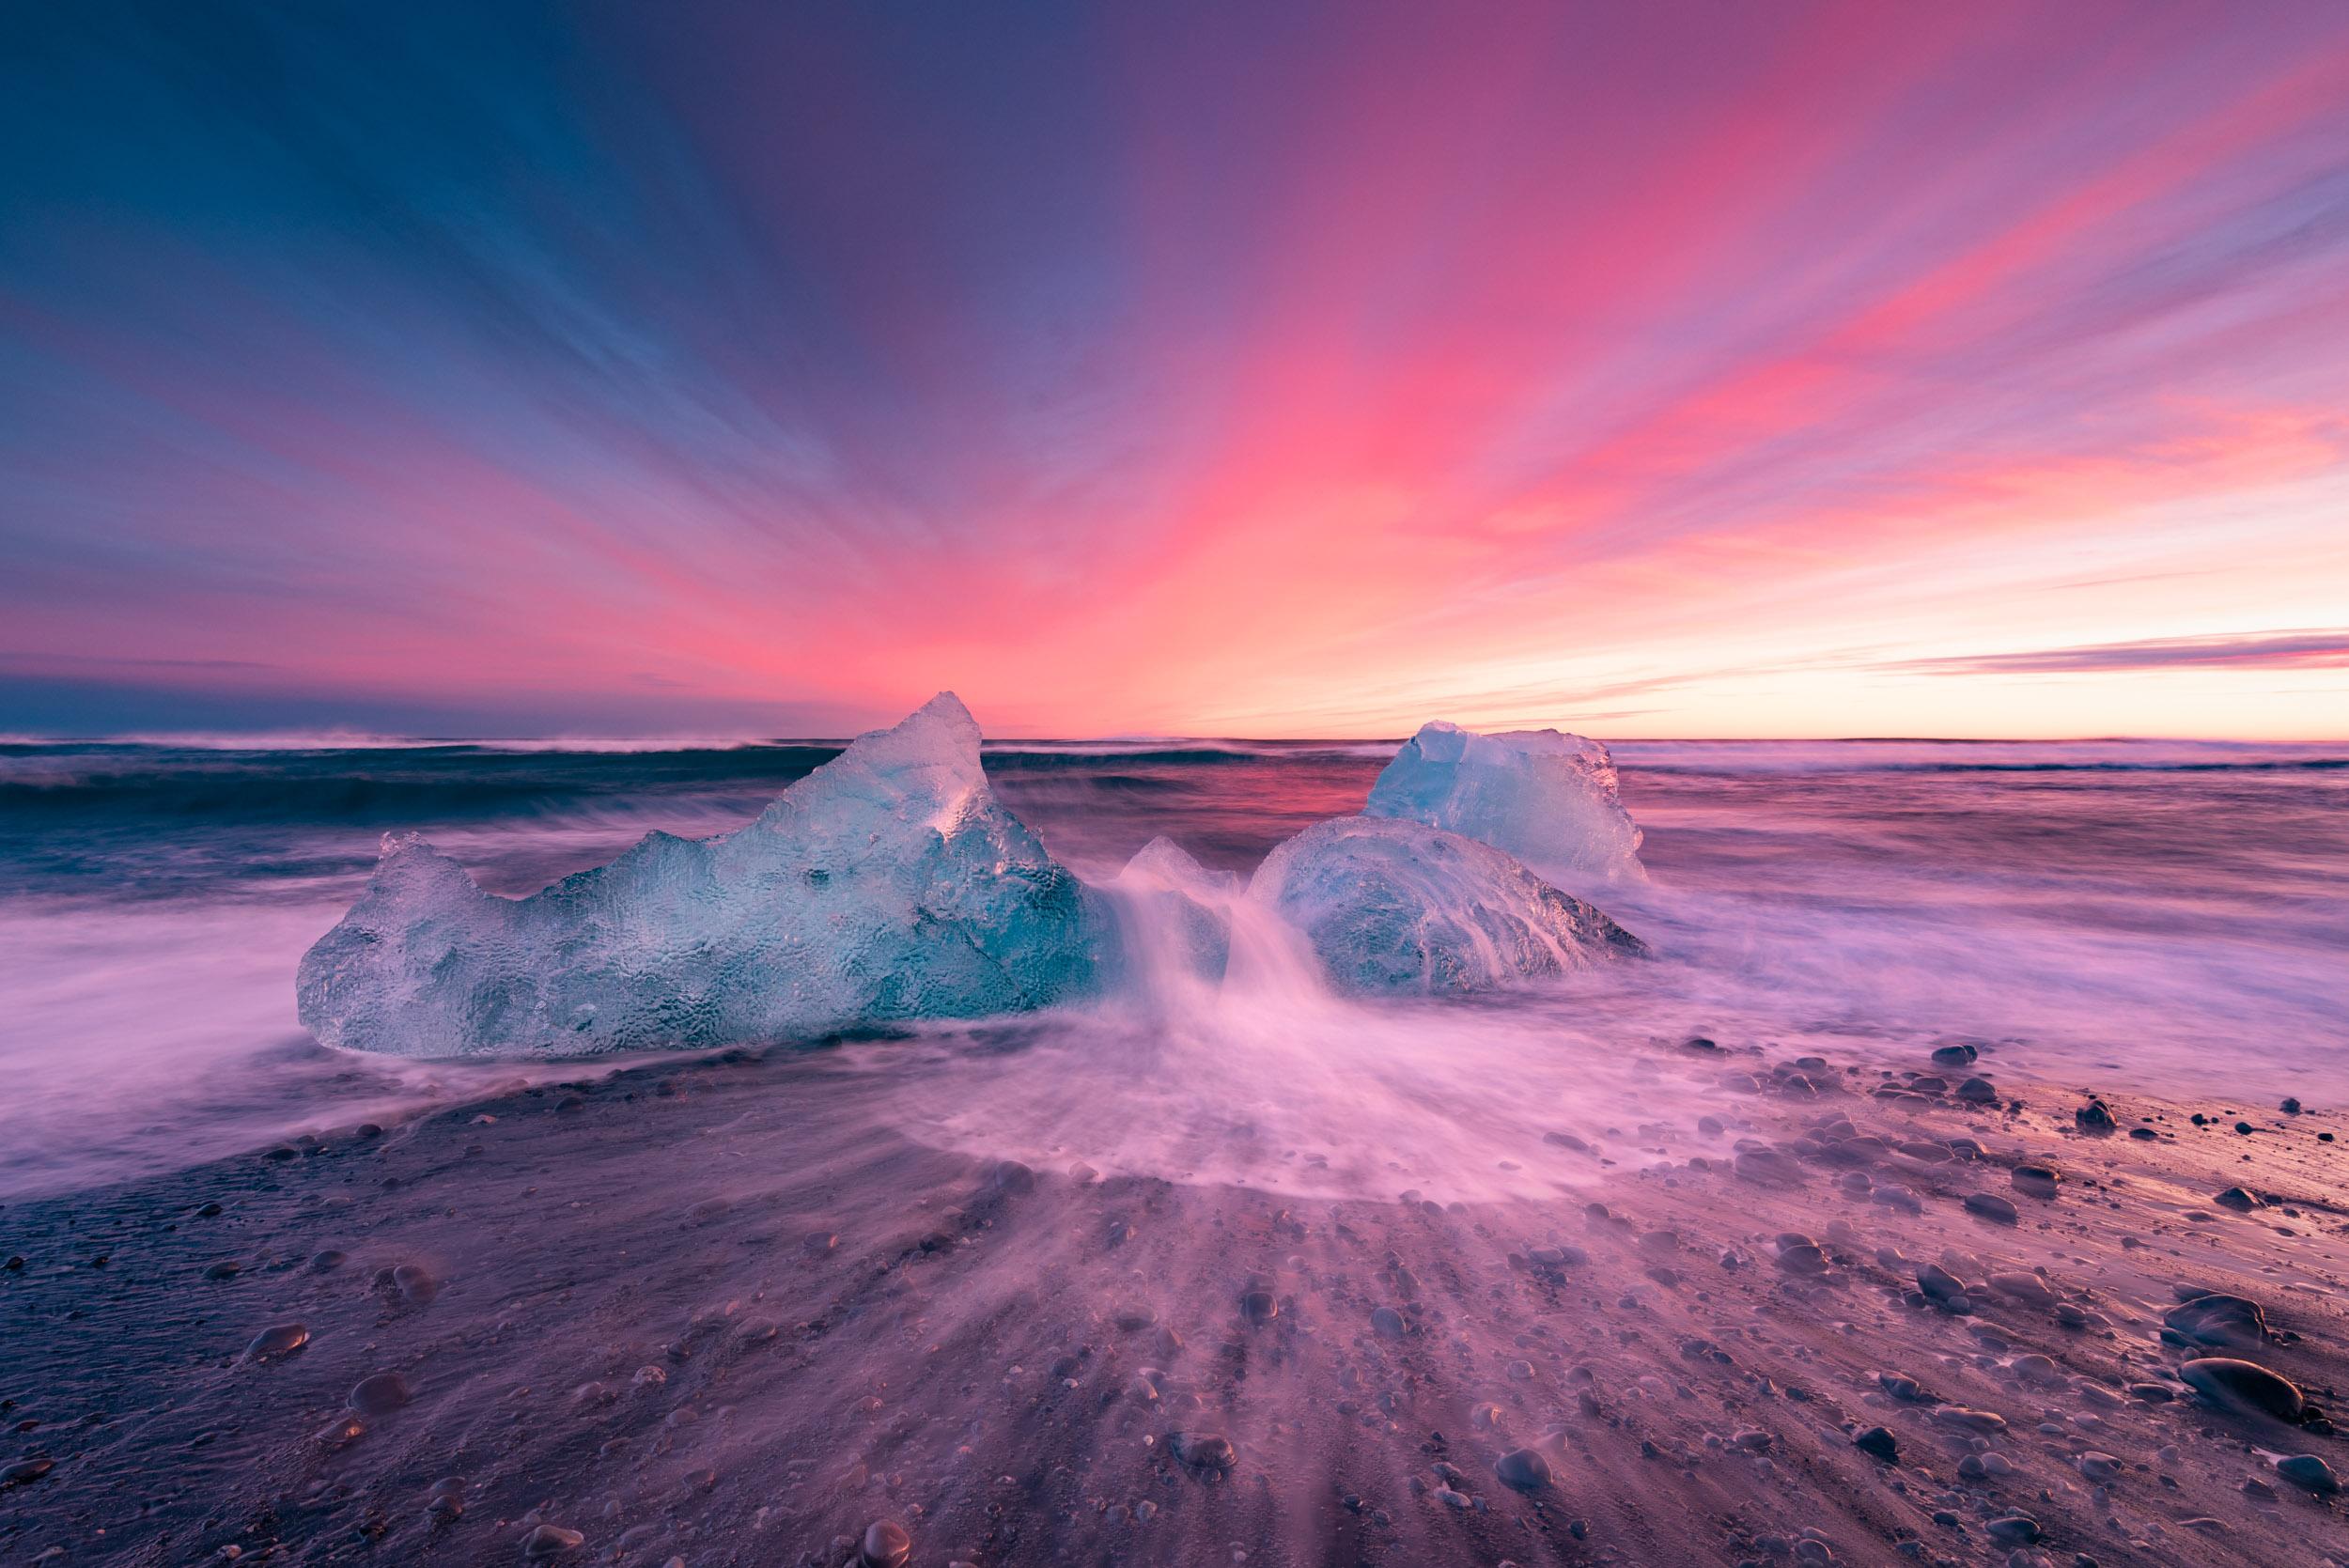 Diamond Beach Iceland, Iceland, Diamond Beach, Sunset, Long Exposure, Ice Beach, Ice, Ocean, Brad Geddes Photography, Brad Geddes